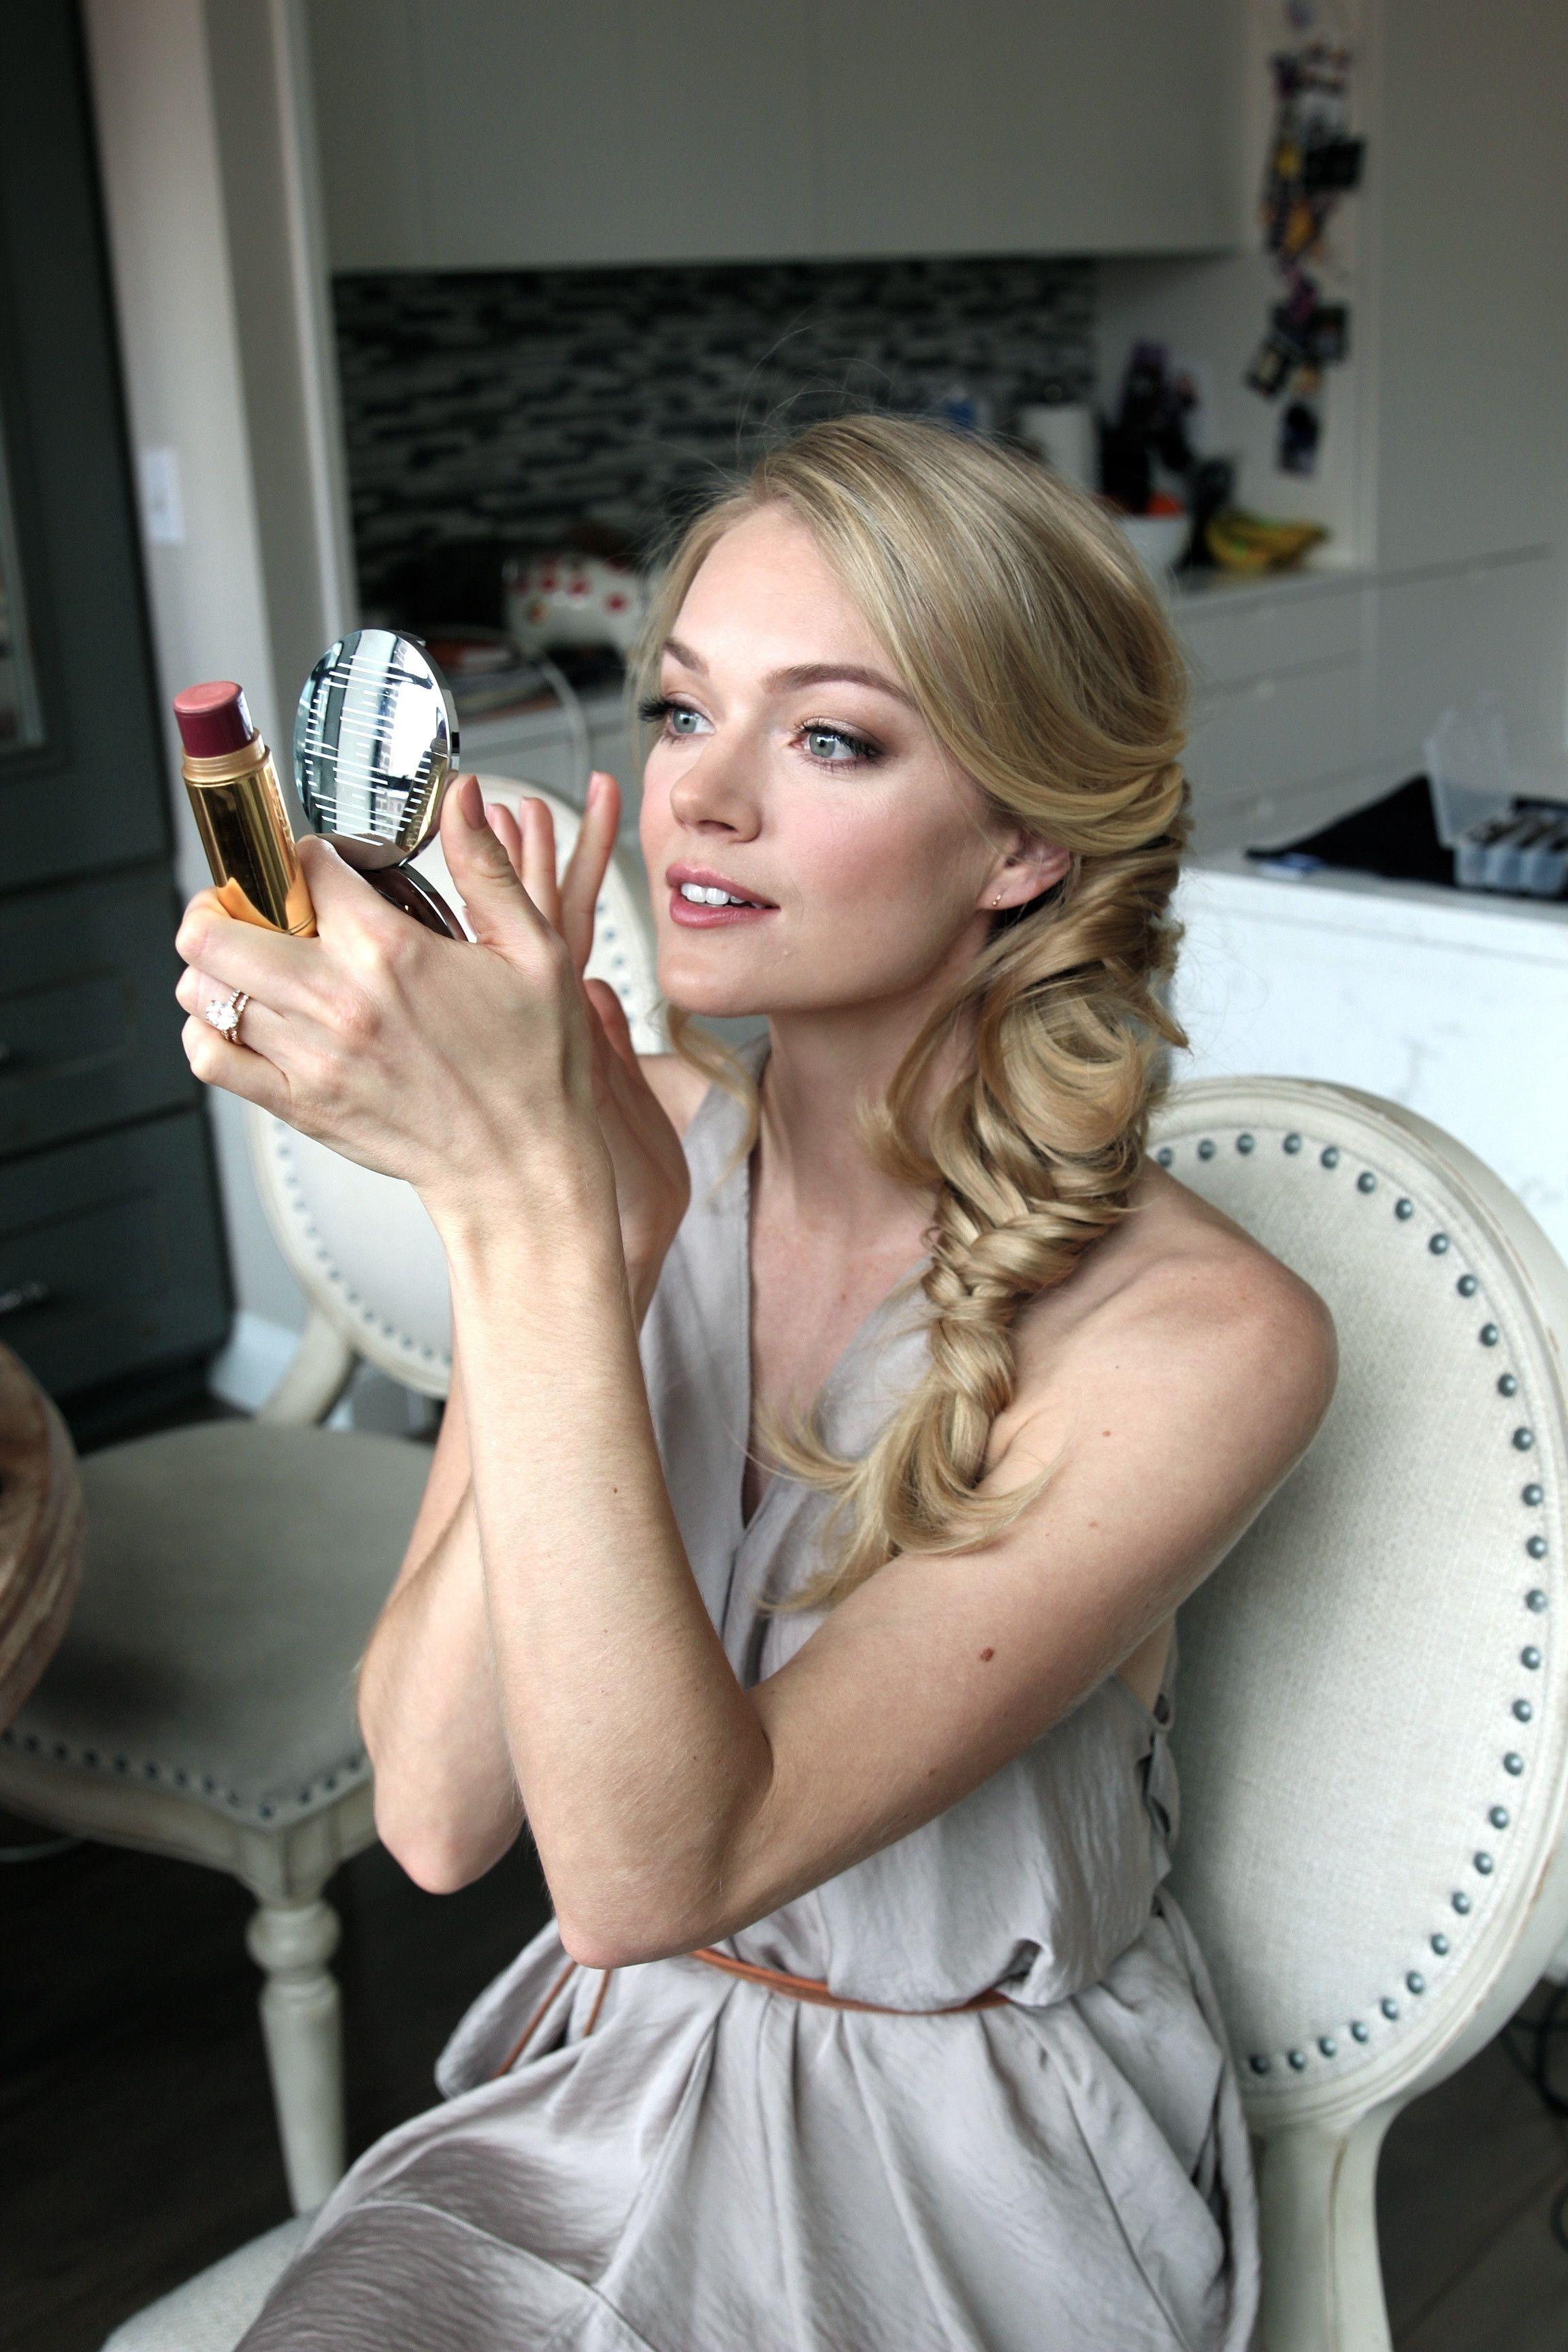 Meet Our New Guest Editor: Lindsay Ellingson pics